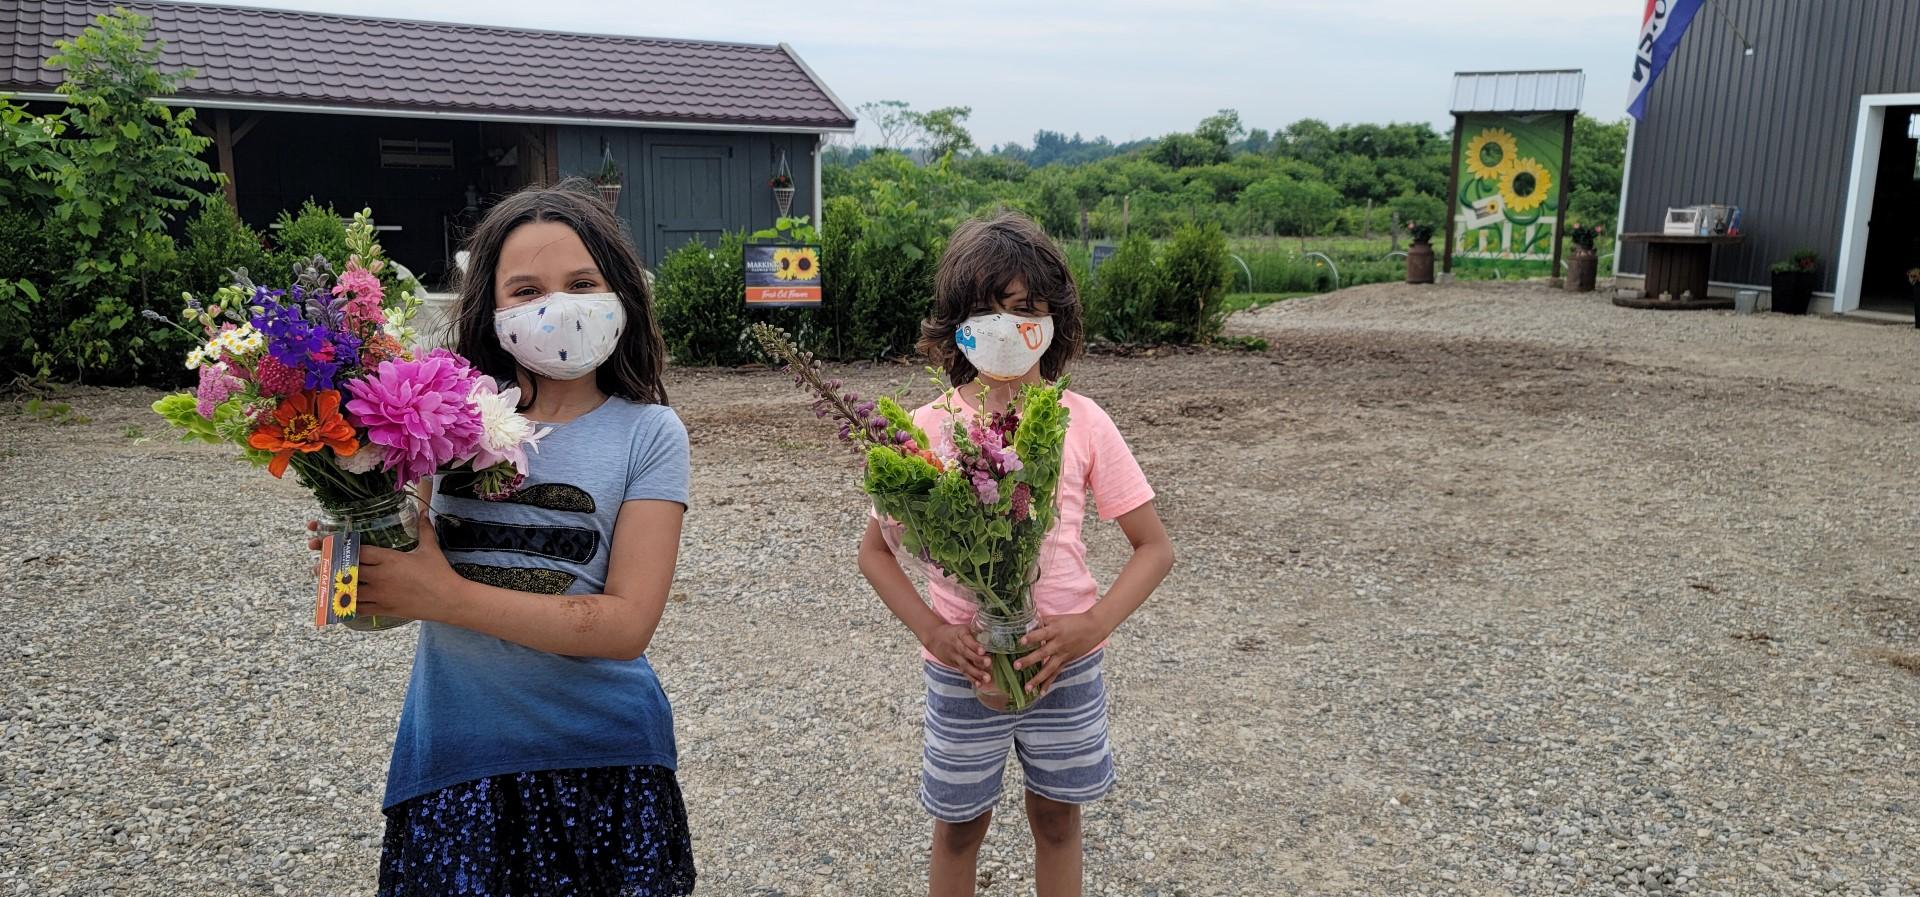 Masked kids holding flower bouquet